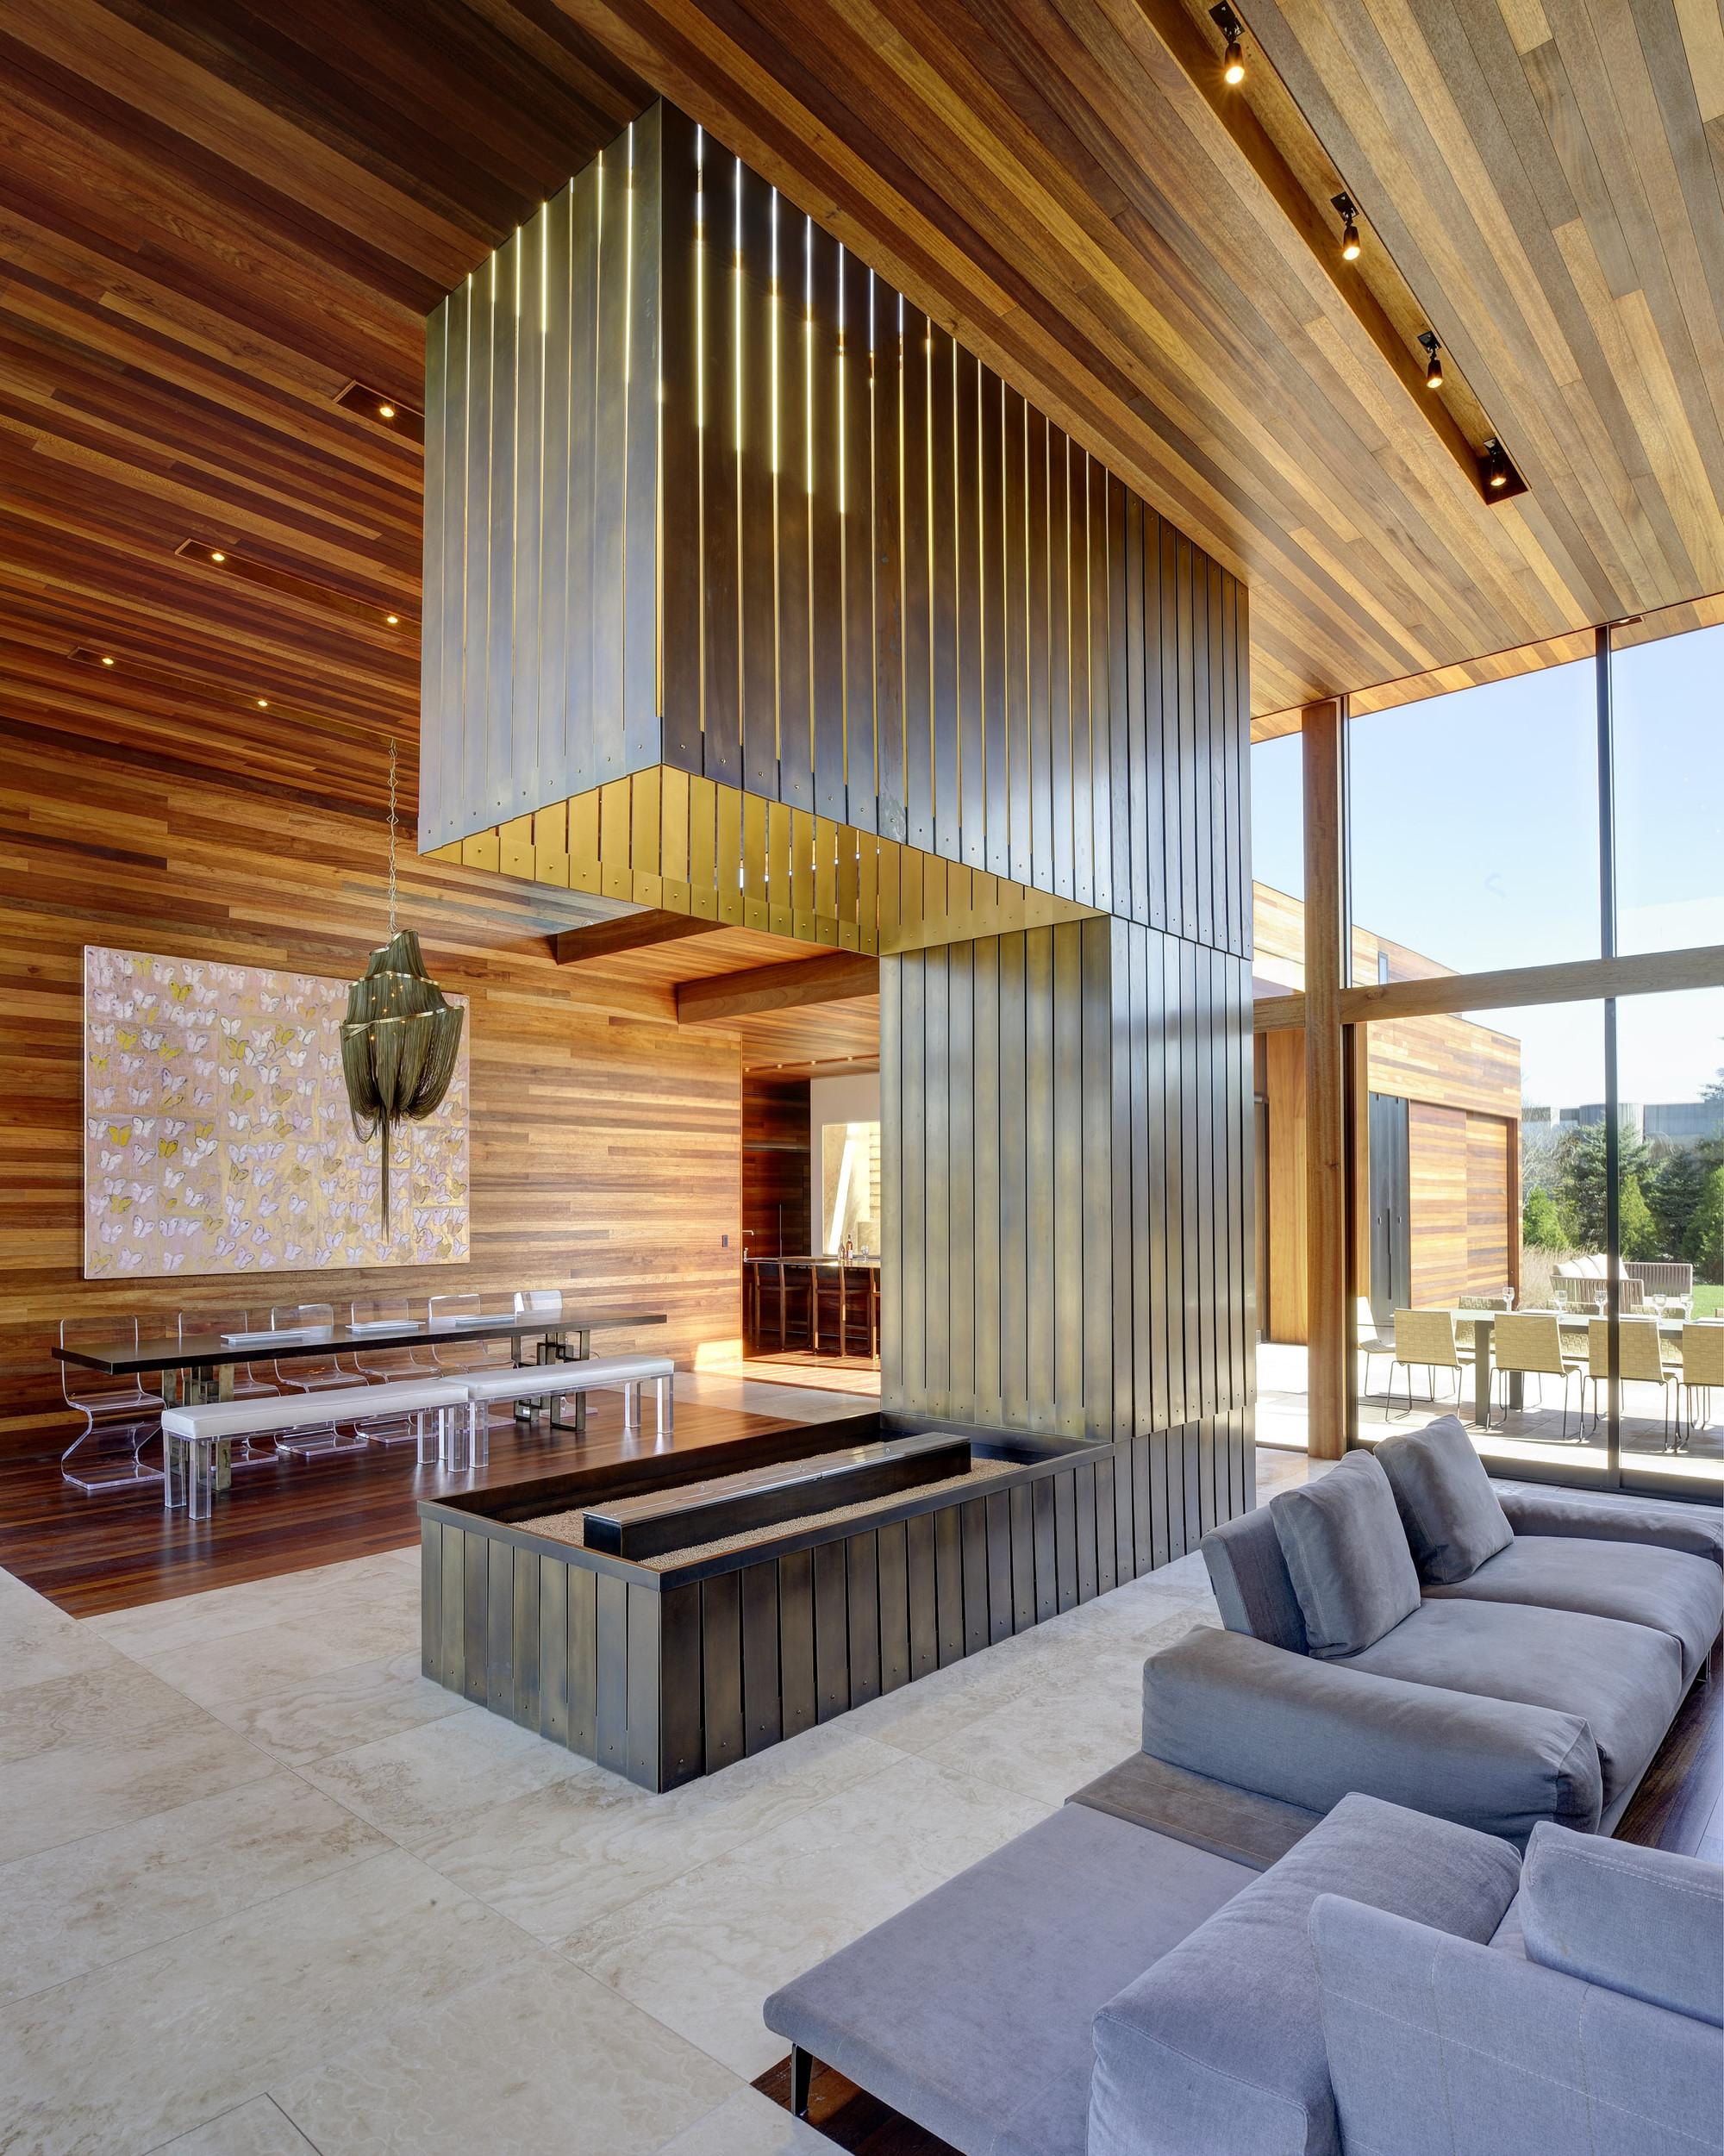 Sam's Creek / Bates Masi Architects